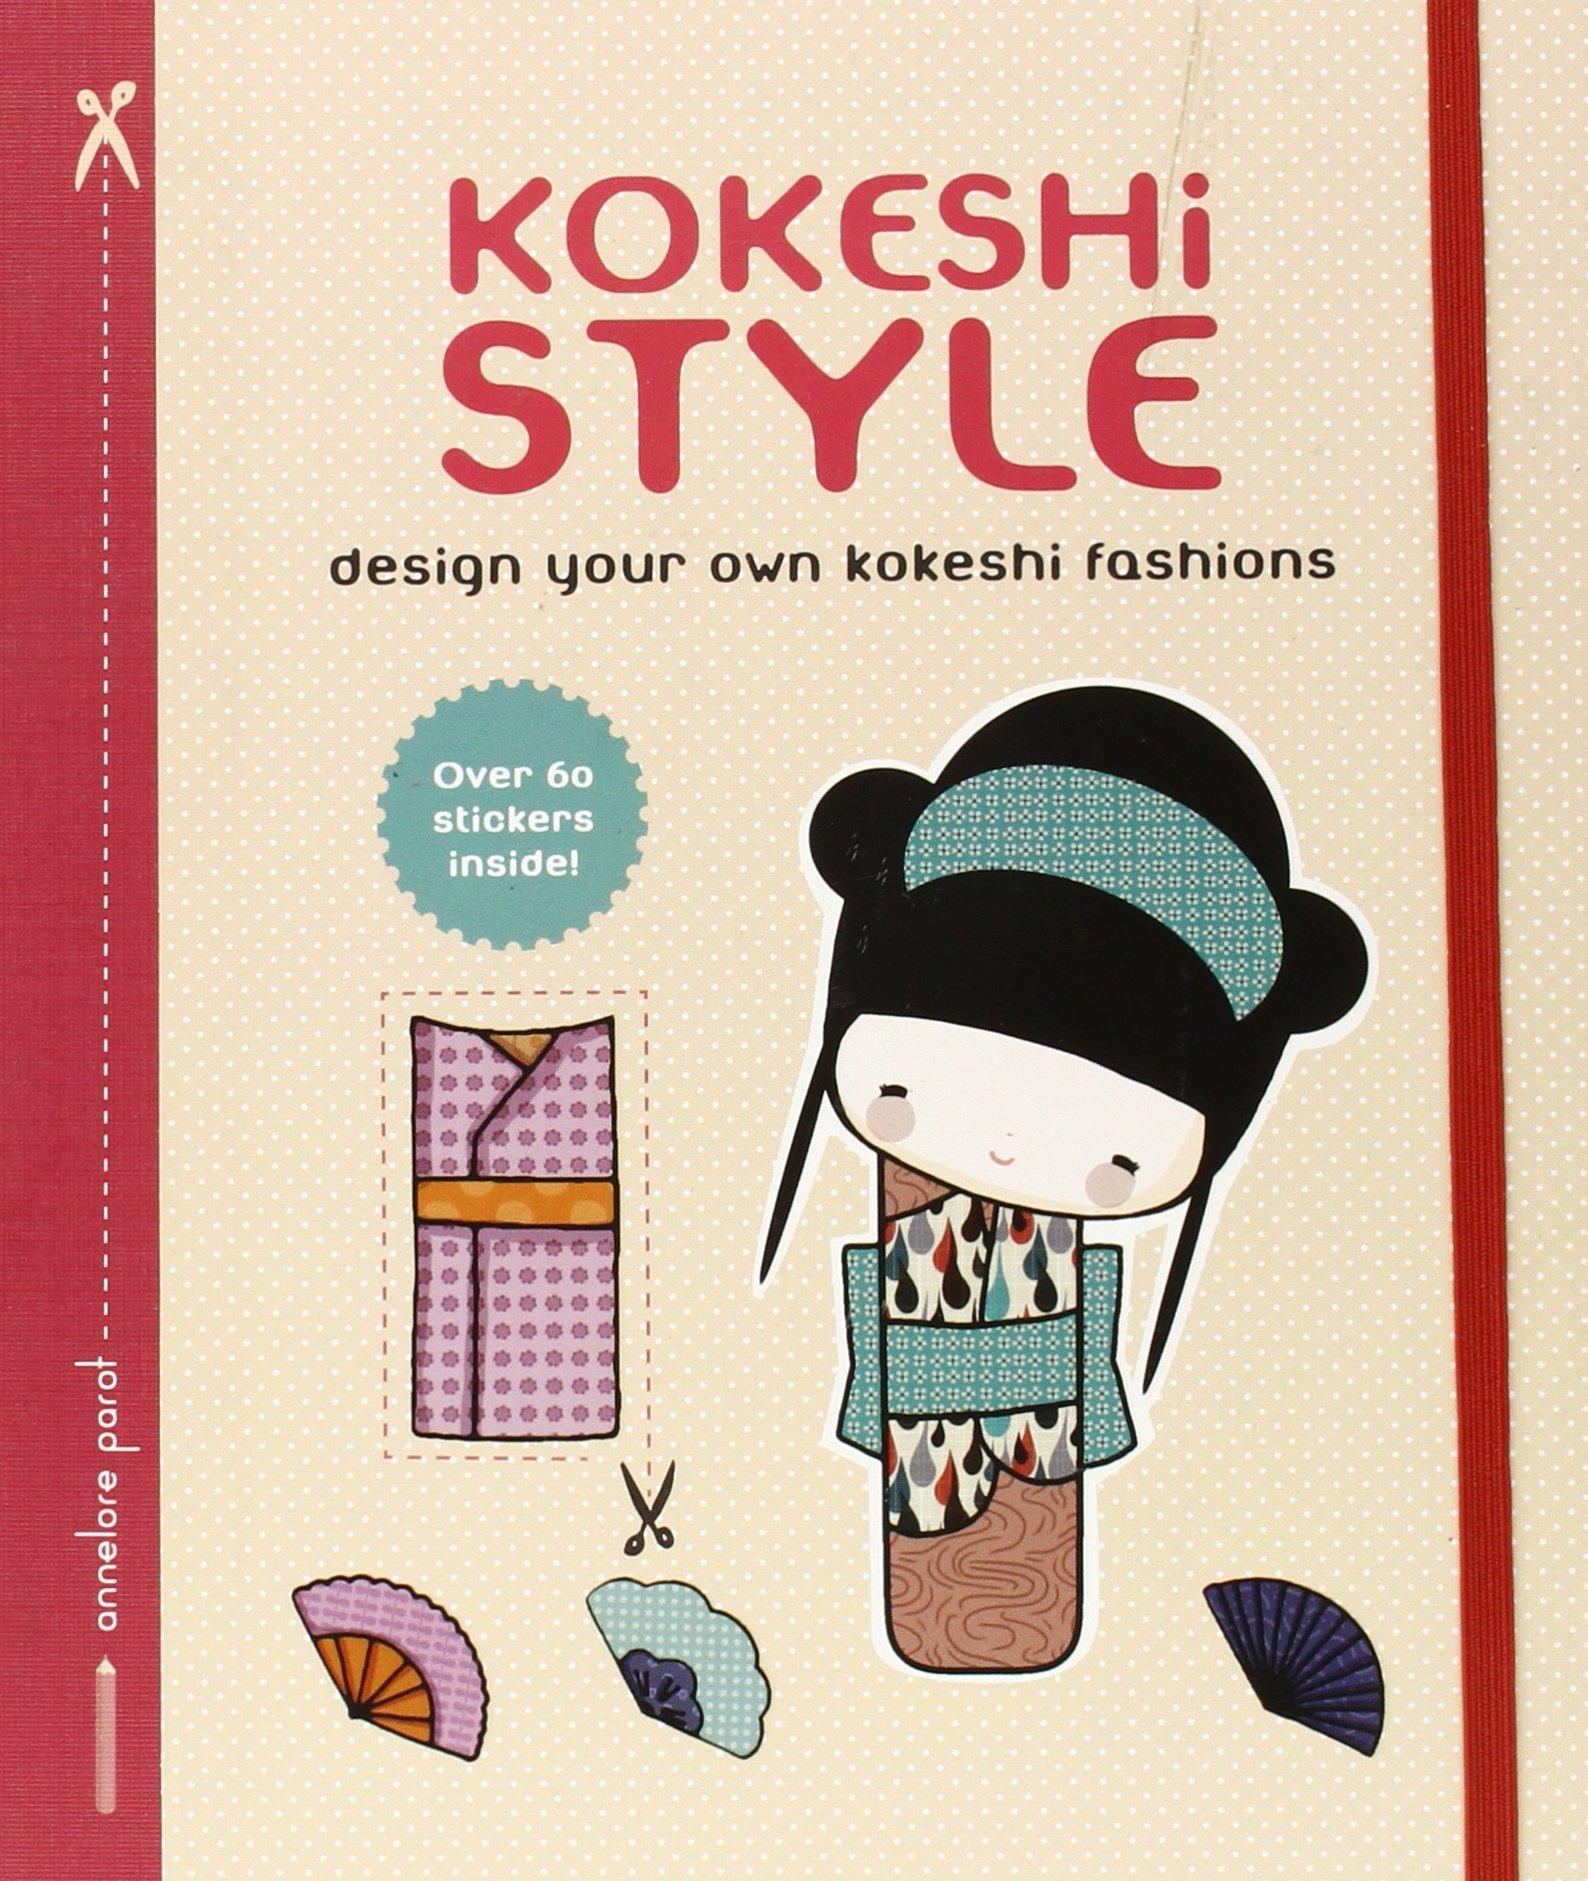 Amazon Fr Kokeshi Style Design Your Own Kokeshi Fashions Parot Annelore Livres